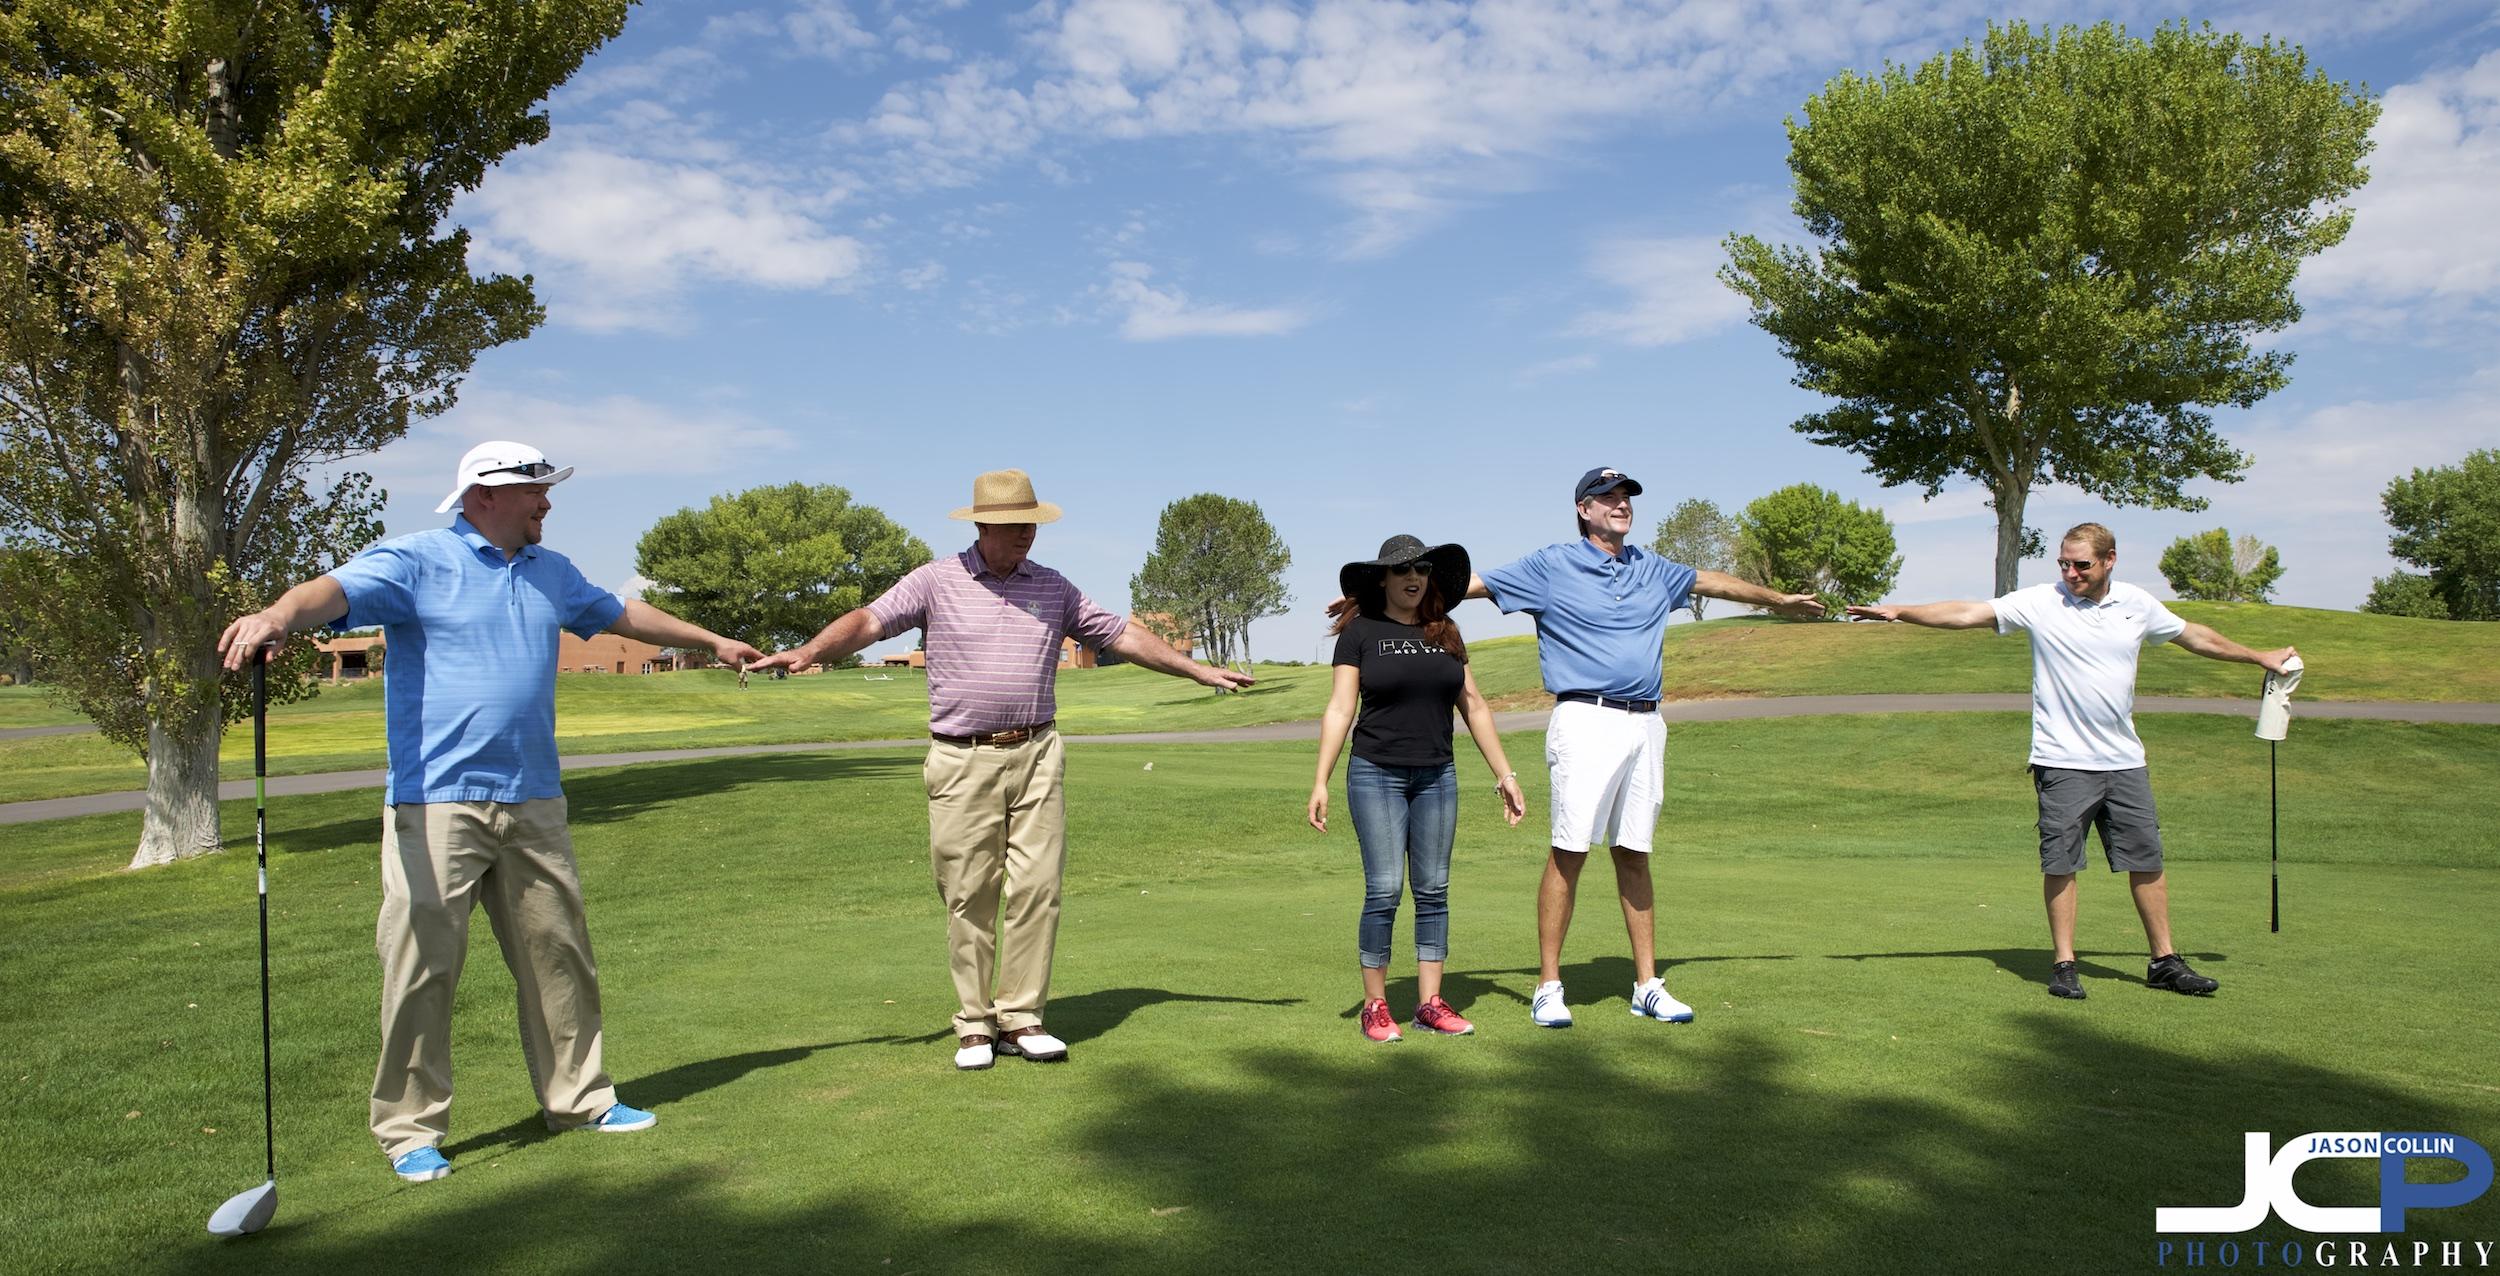 ahcc-8-16-2018-golf-100536.jpg